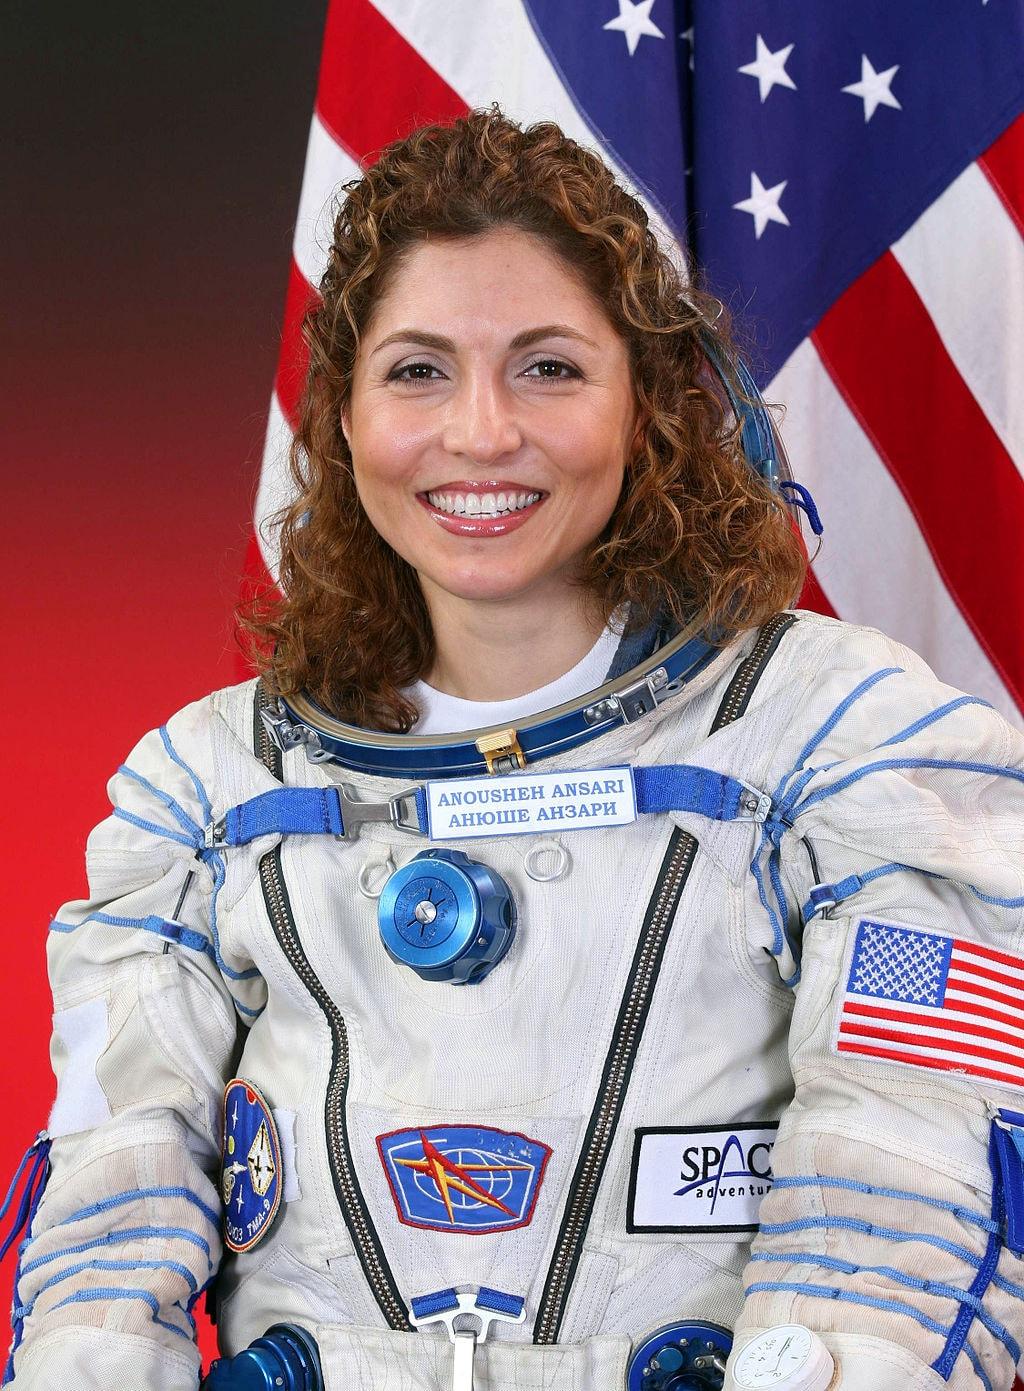 Anousheh Ansari, the first female private space explorer is Iranian-American | NASA / Wikimedia Commons